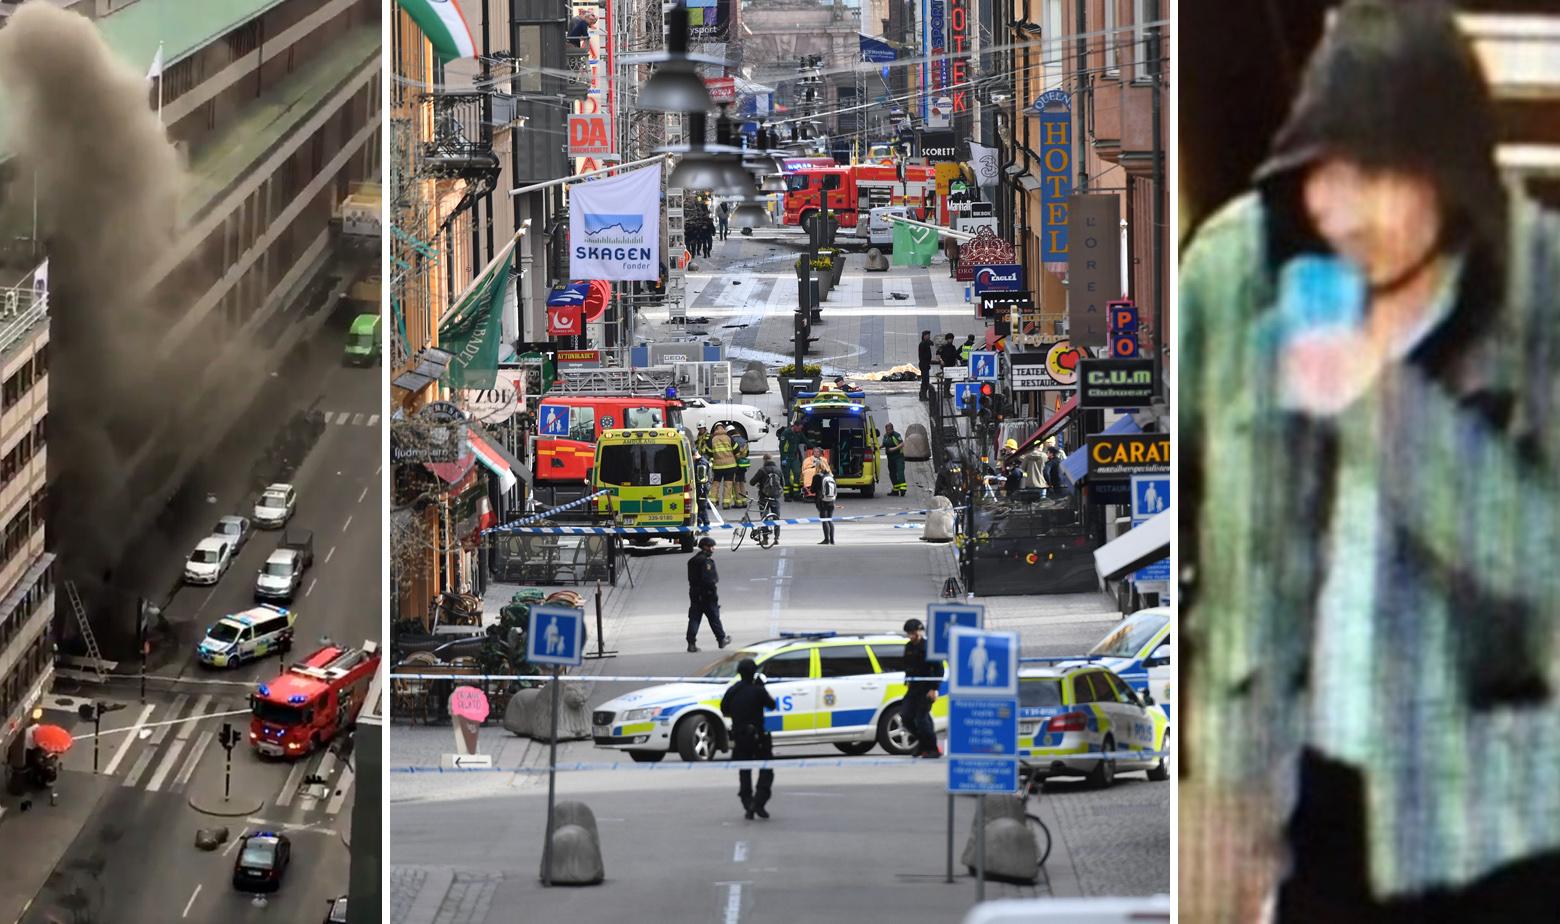 Švedska Stockholm napad